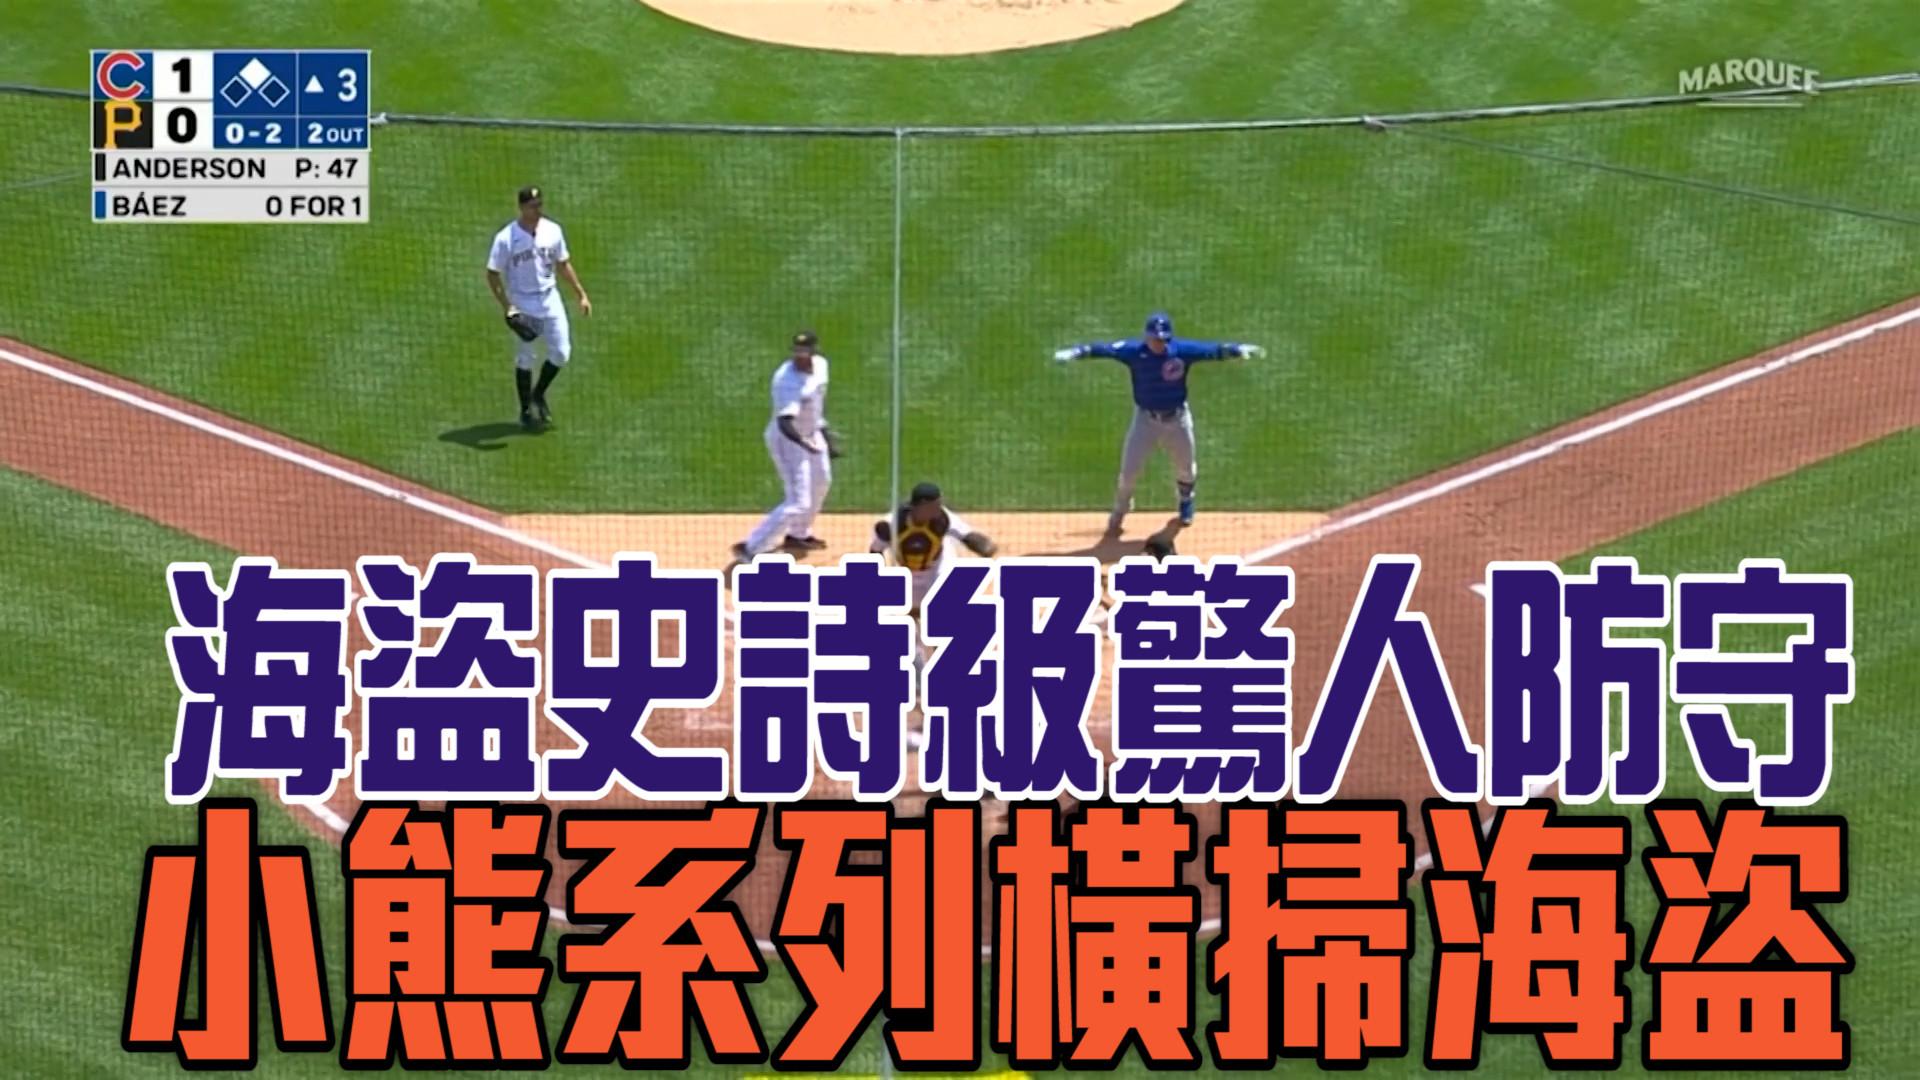 【MLB看愛爾達】本壘與一壘間夾殺? 海盜史上最荒謬防守 05/28